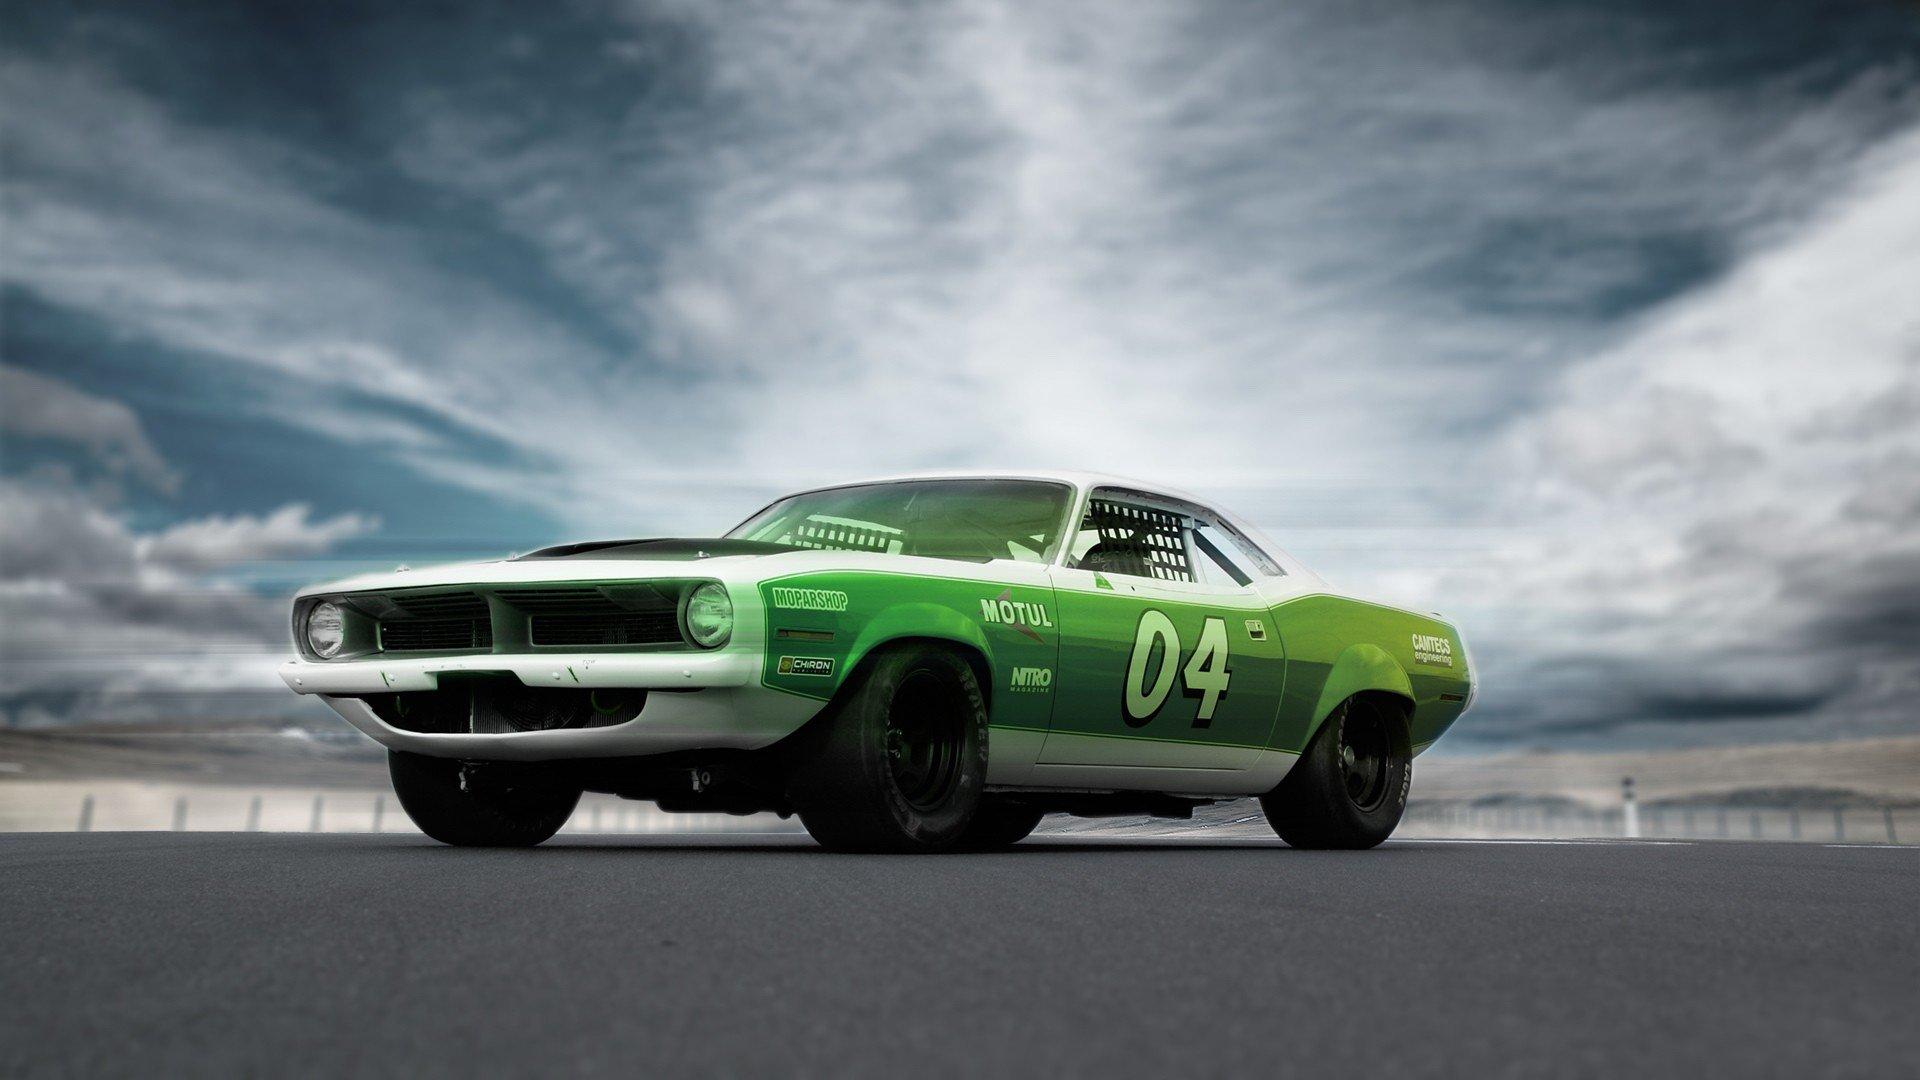 [44+] HD Wallpapers Classic Cars On WallpaperSafari